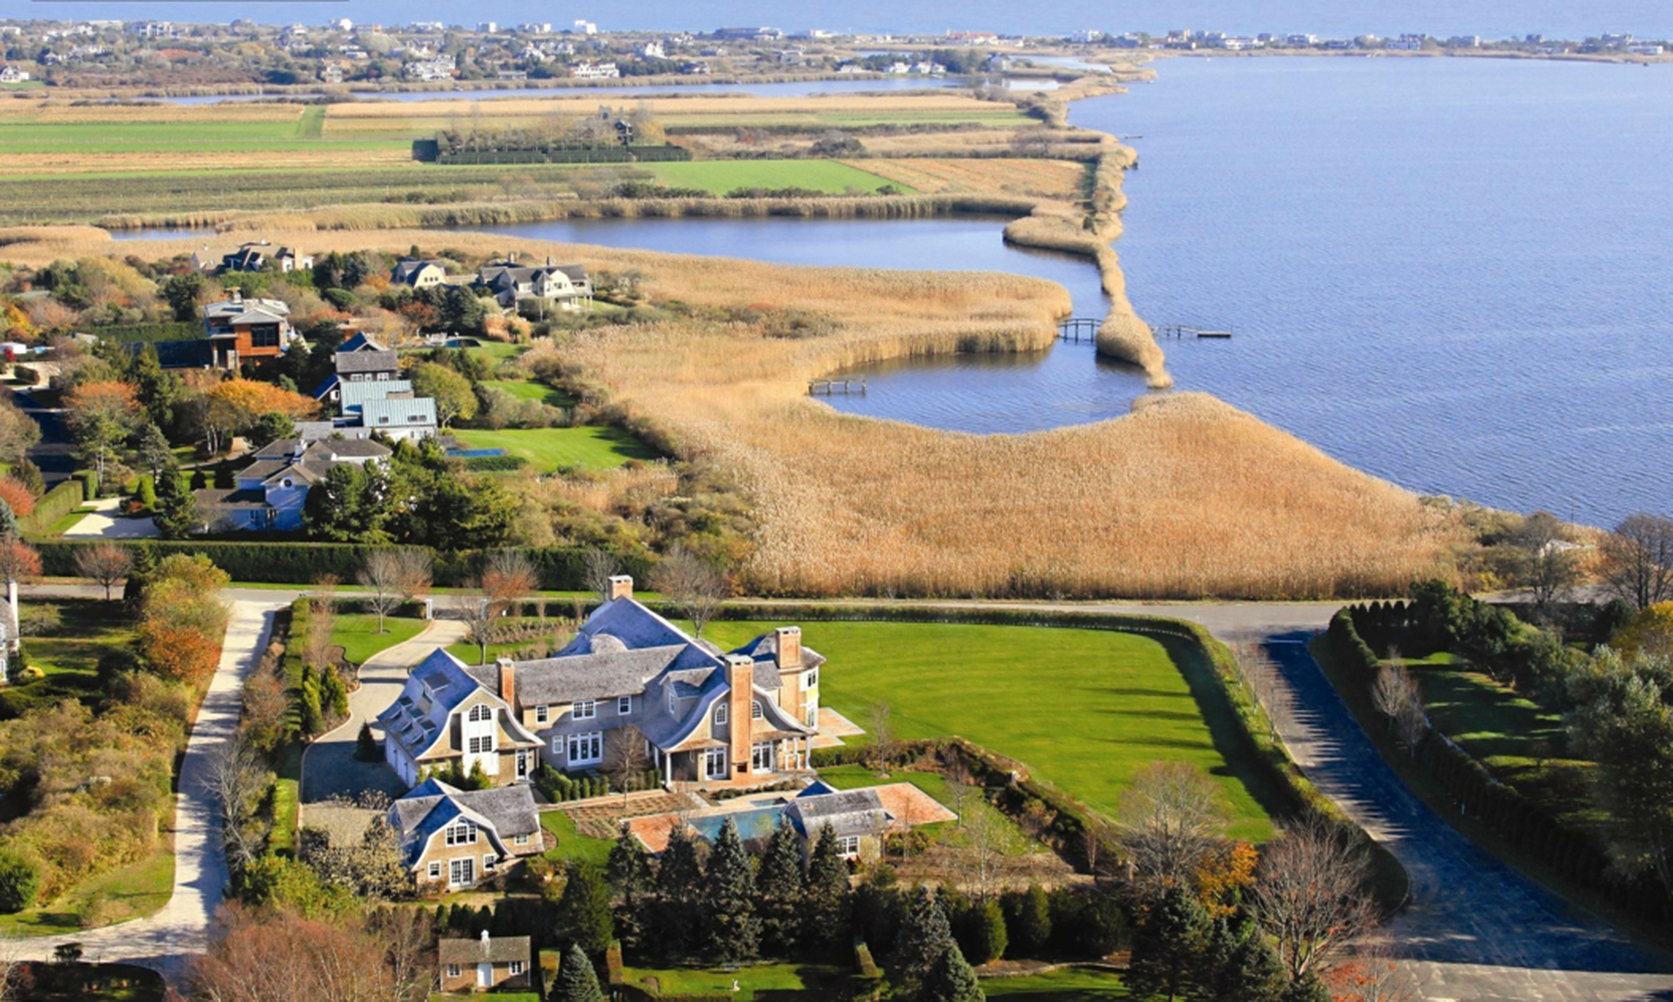 Casa de Jennifer López en Water Mill, NY -Los Hamptons